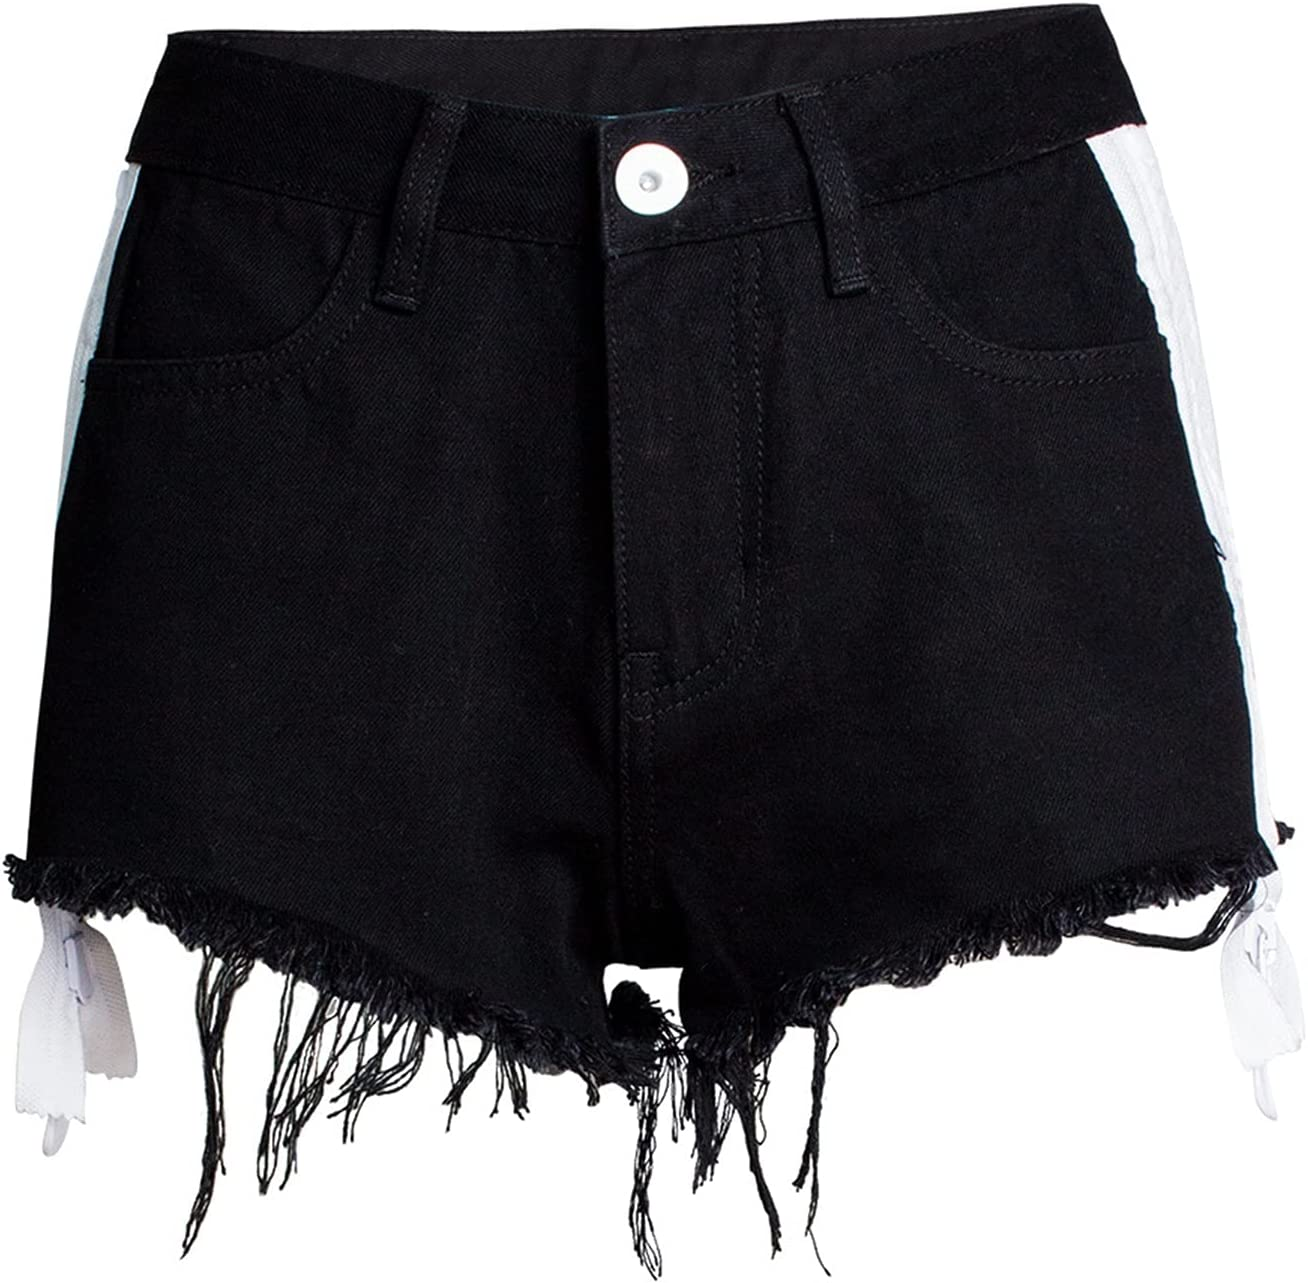 SBCDY Women's Destroyed Ripped Hole Denim Shorts Sexy Short Jeans Summer High Waist Denim Shorts Hole Tear Tassel Denim Shorts (Color : Black, Size : 36)